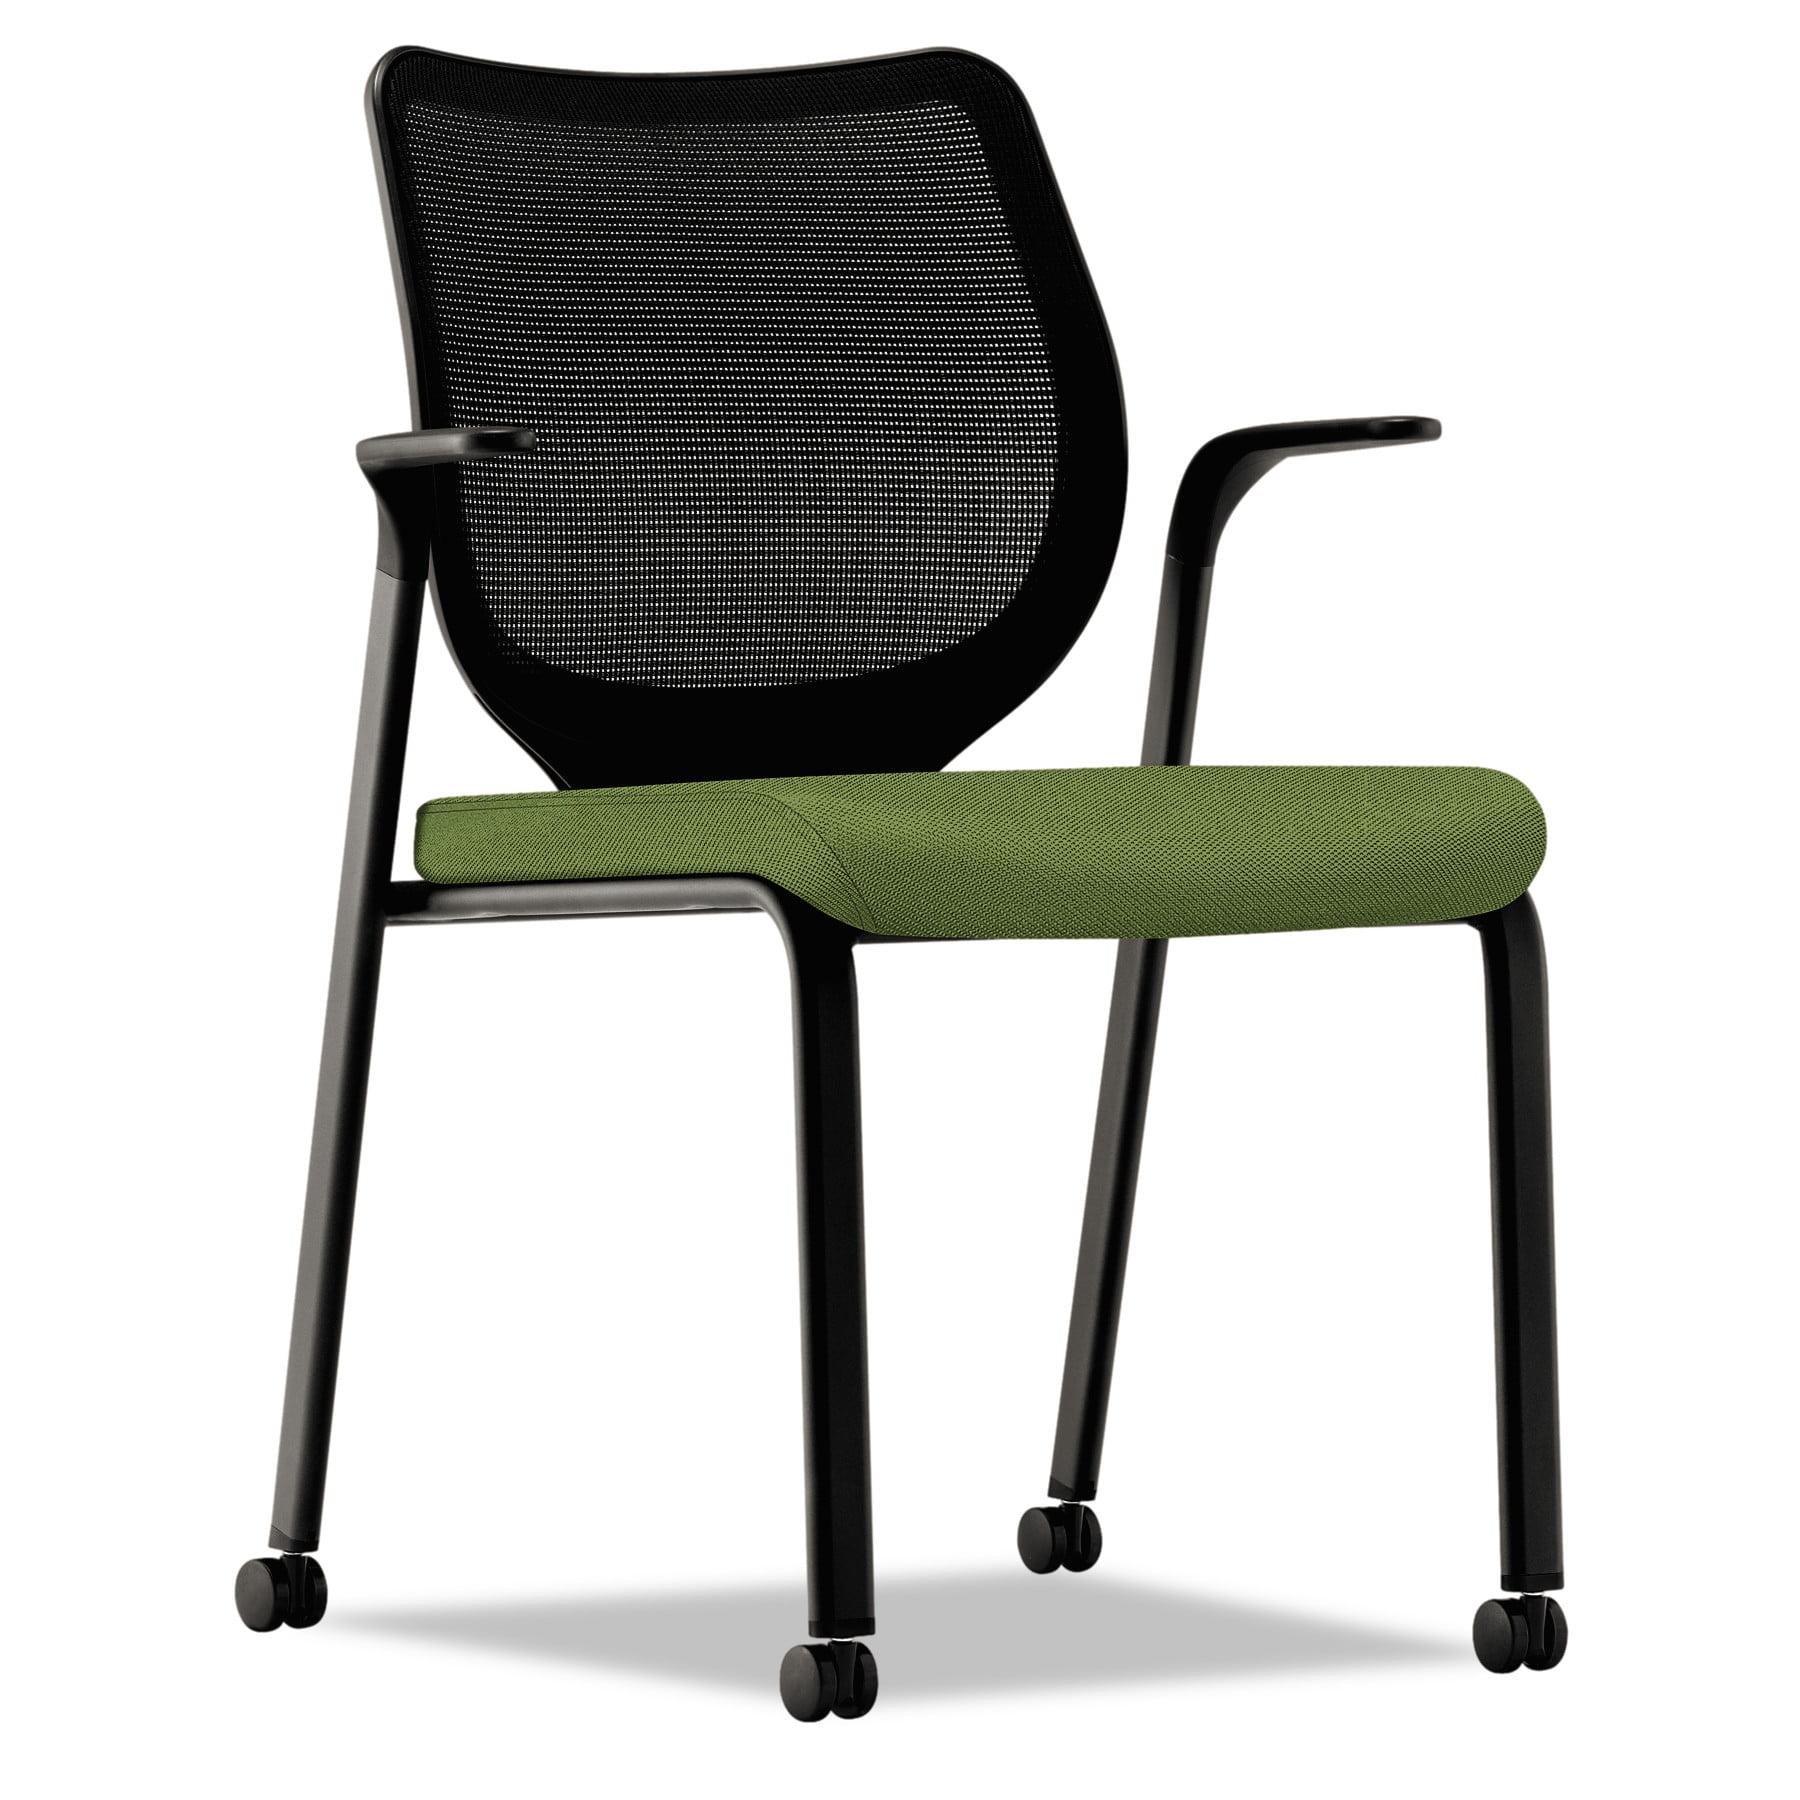 HON Nucleus Series Multipurpose Chair, Black ilira-stretch M4 Back, Clover/Black